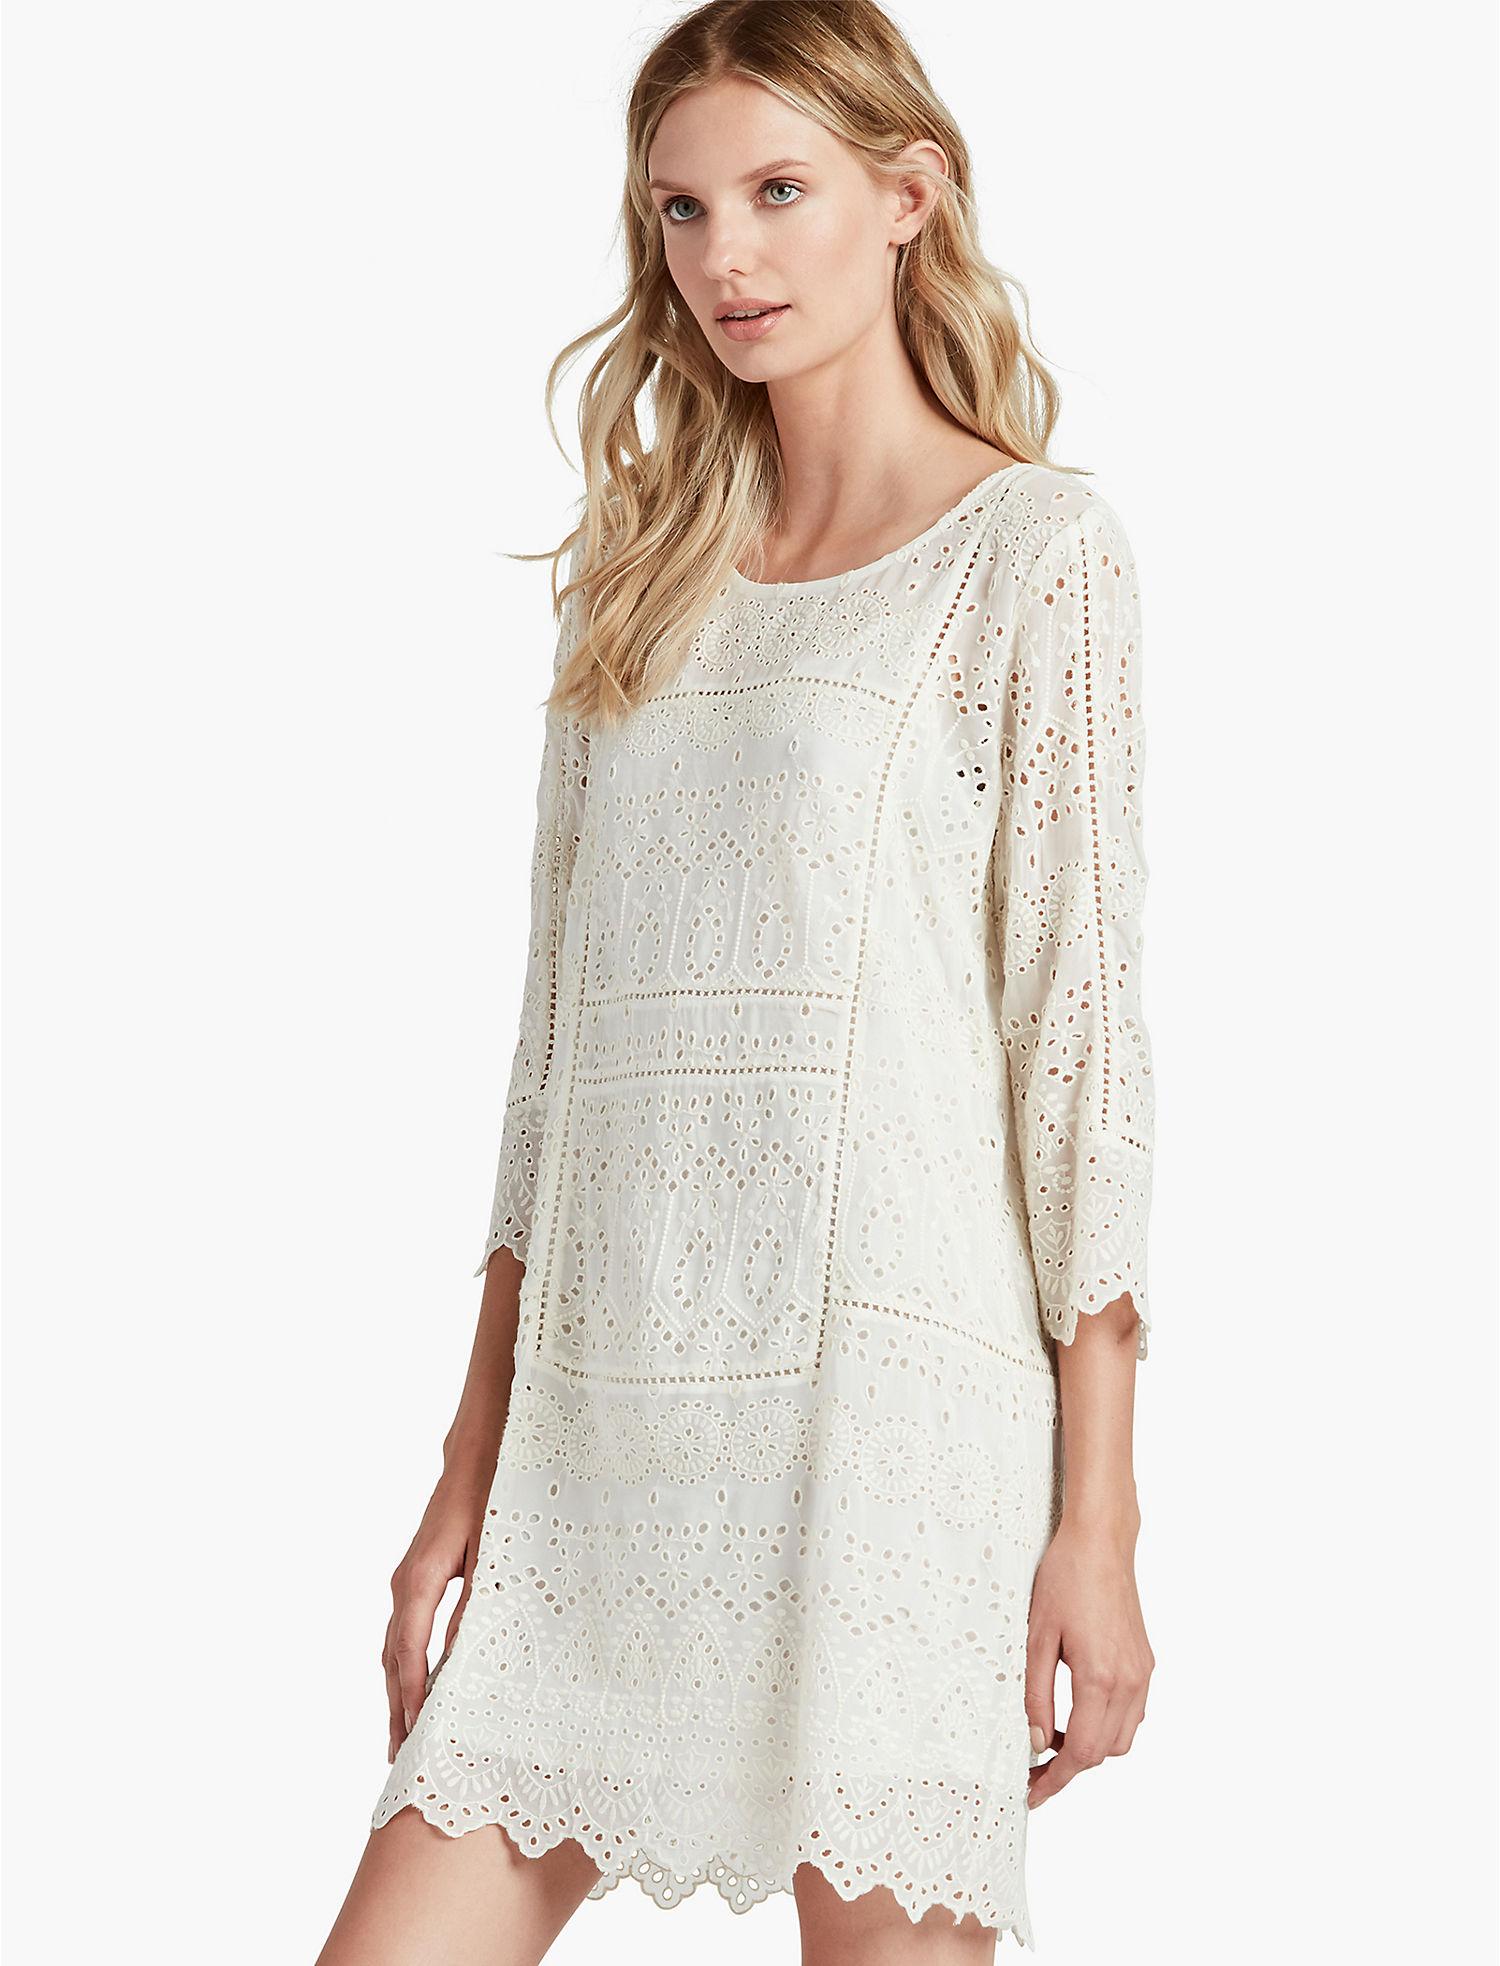 Lace Dresses Brand